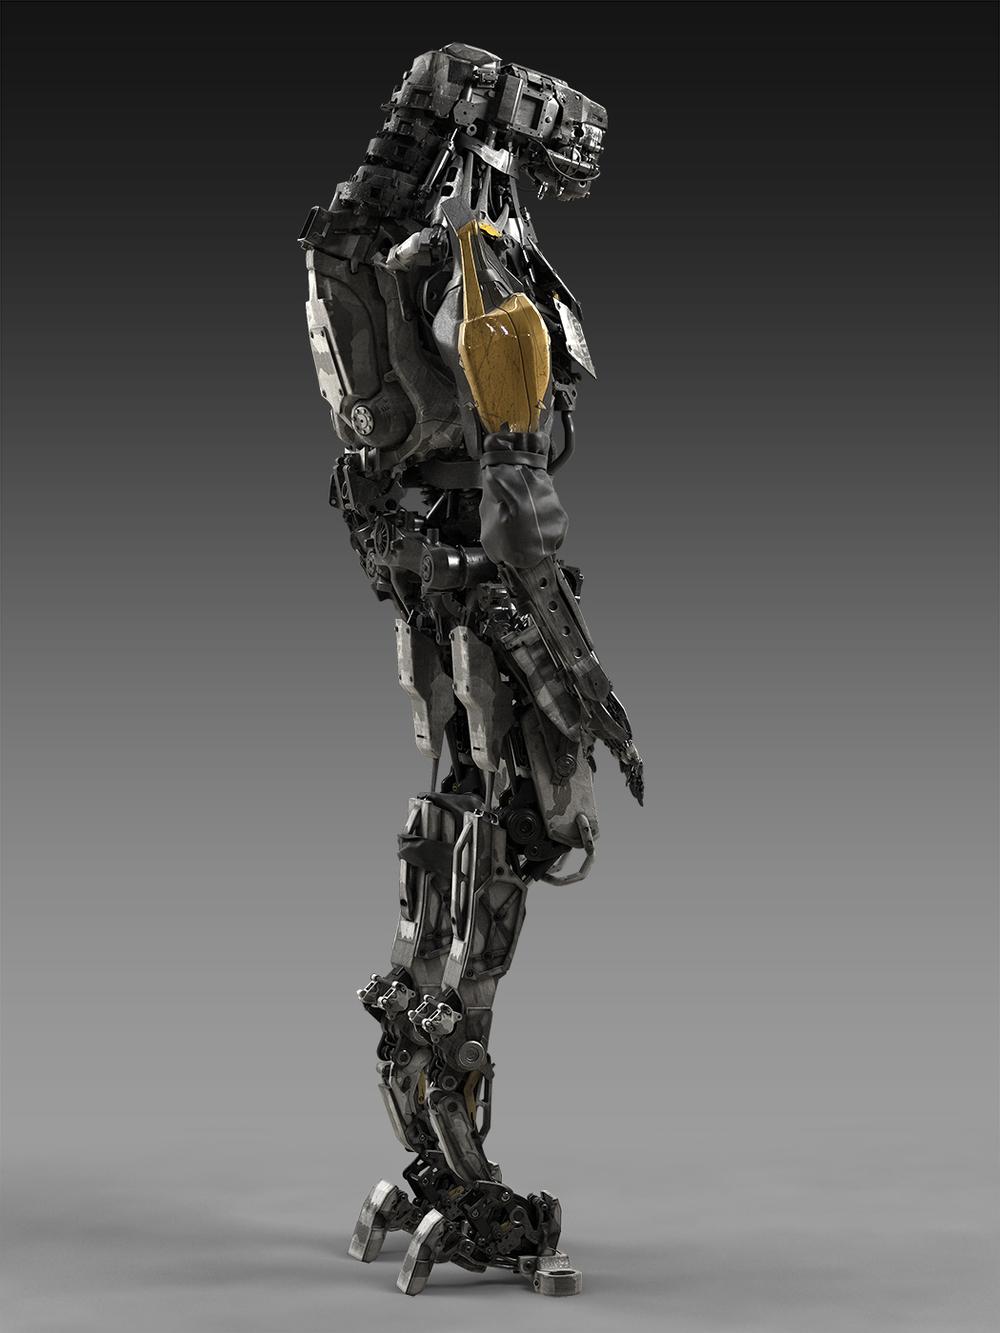 InfantryMech_HiRes_01a.jpg